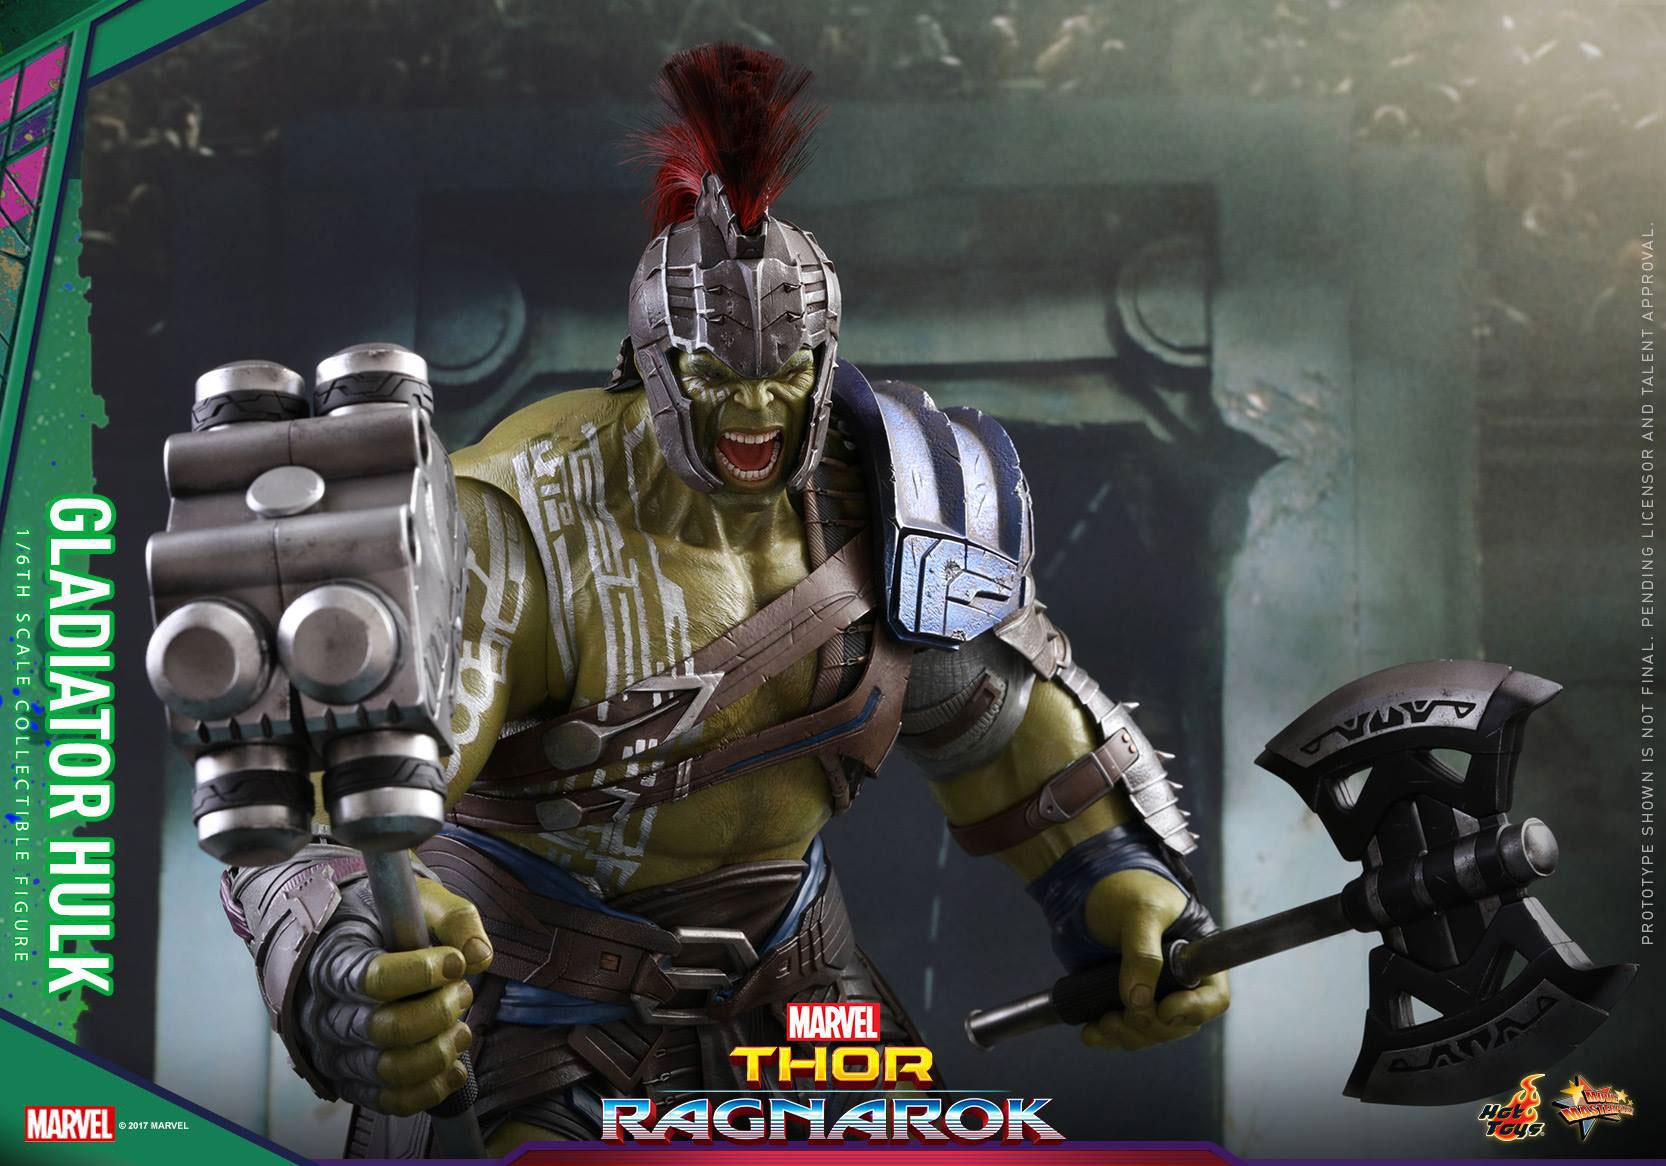 thor-ragnarok-gladiator-hulk-hot-toys-figure-4